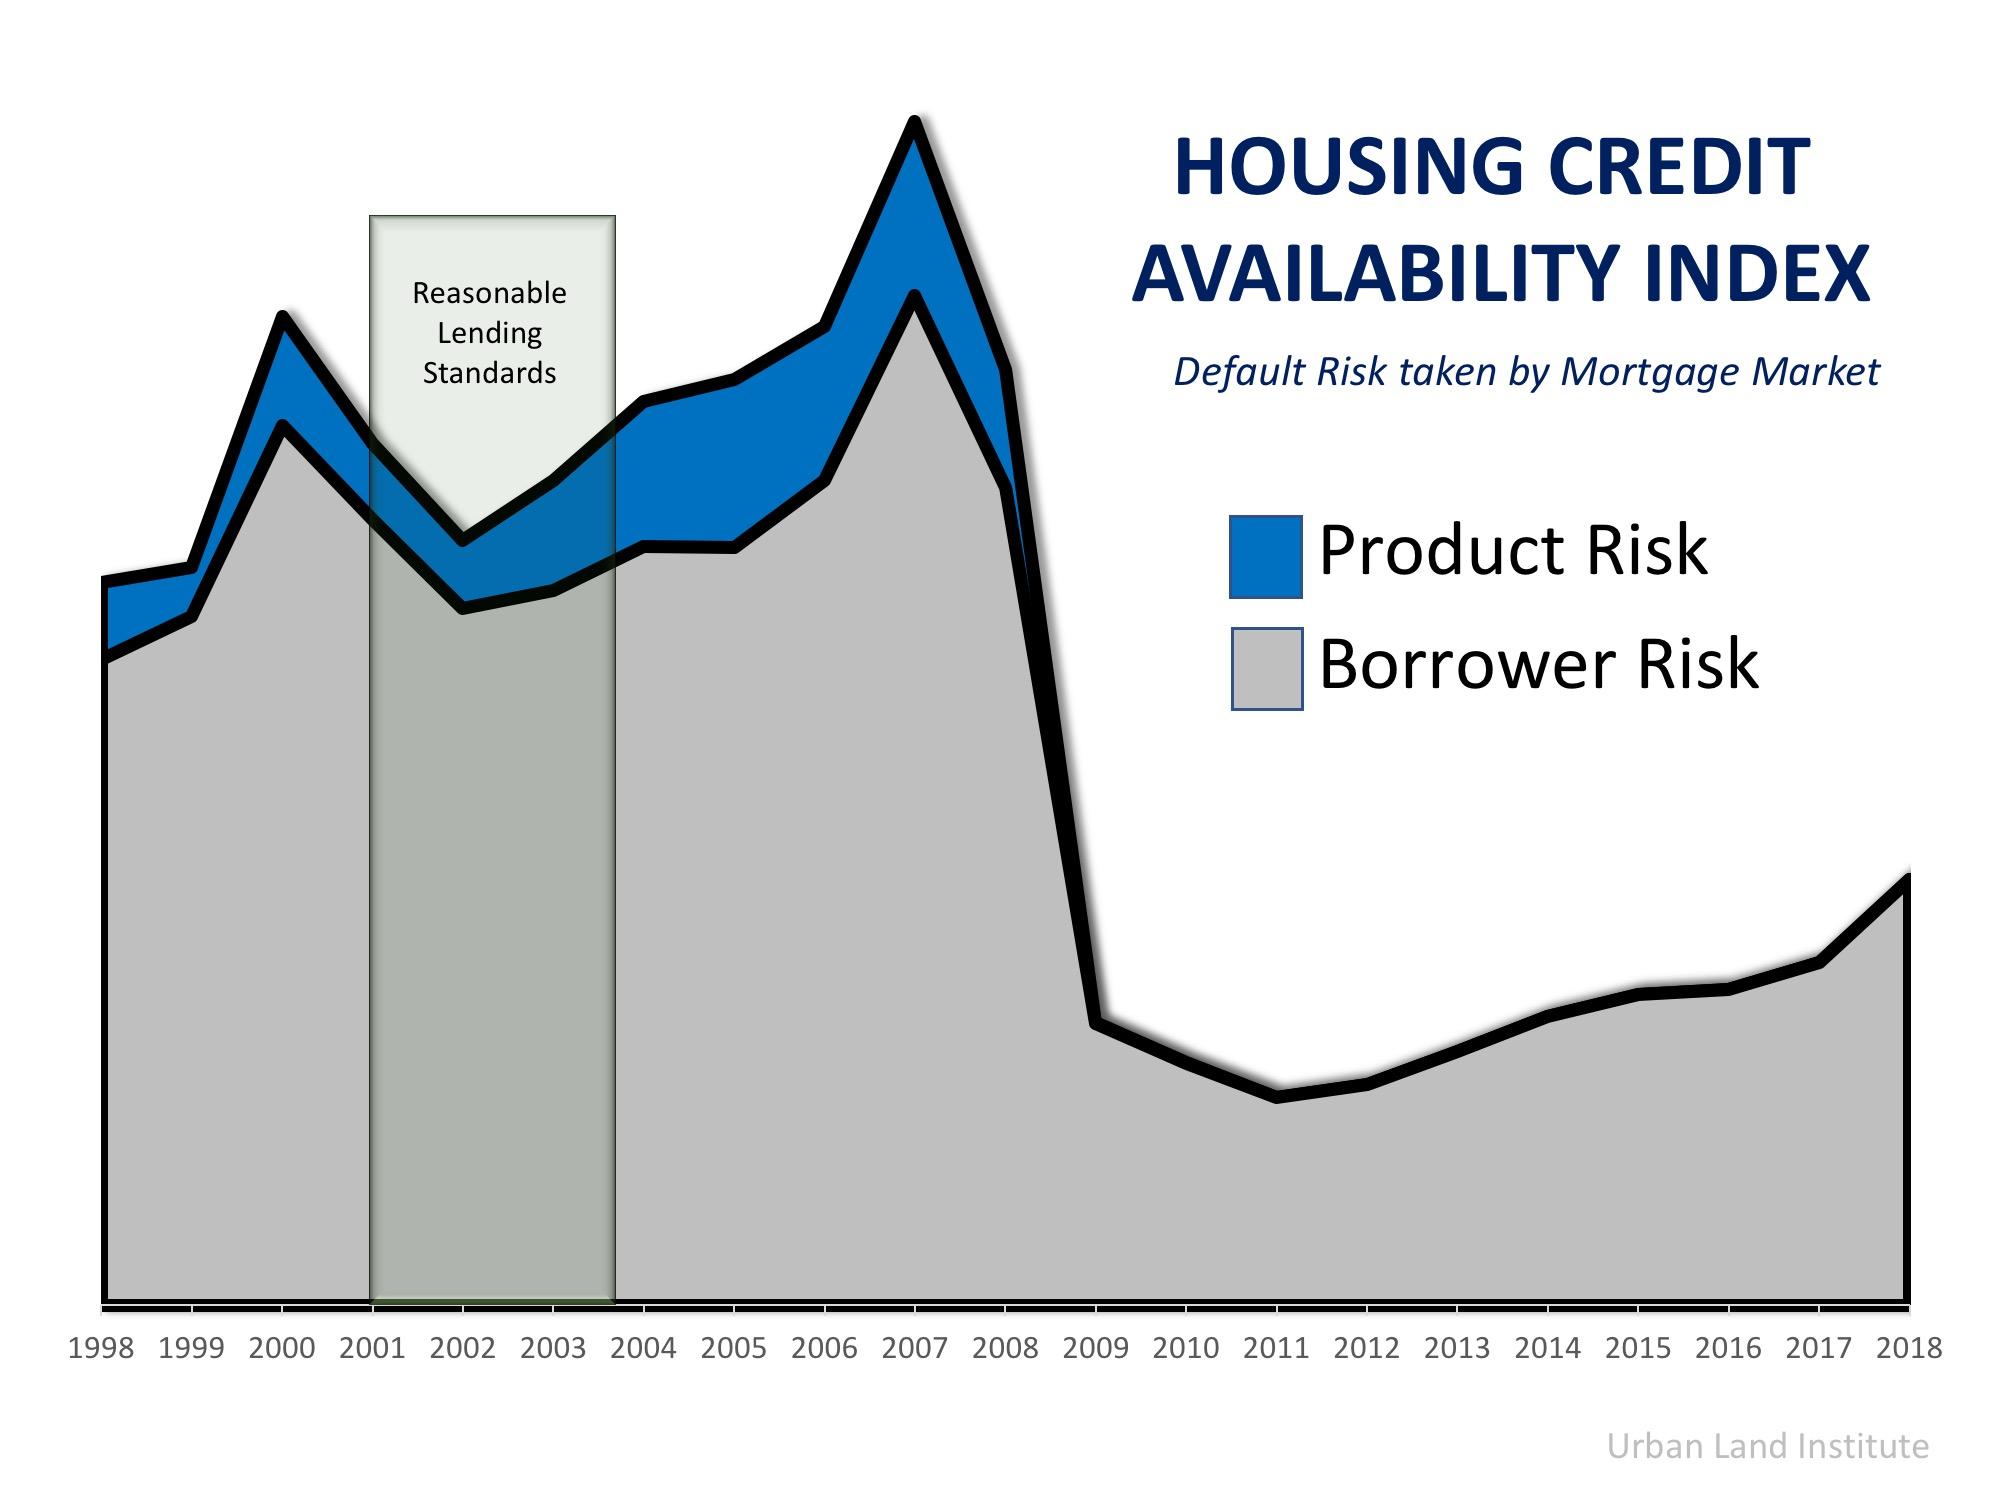 housingcredit